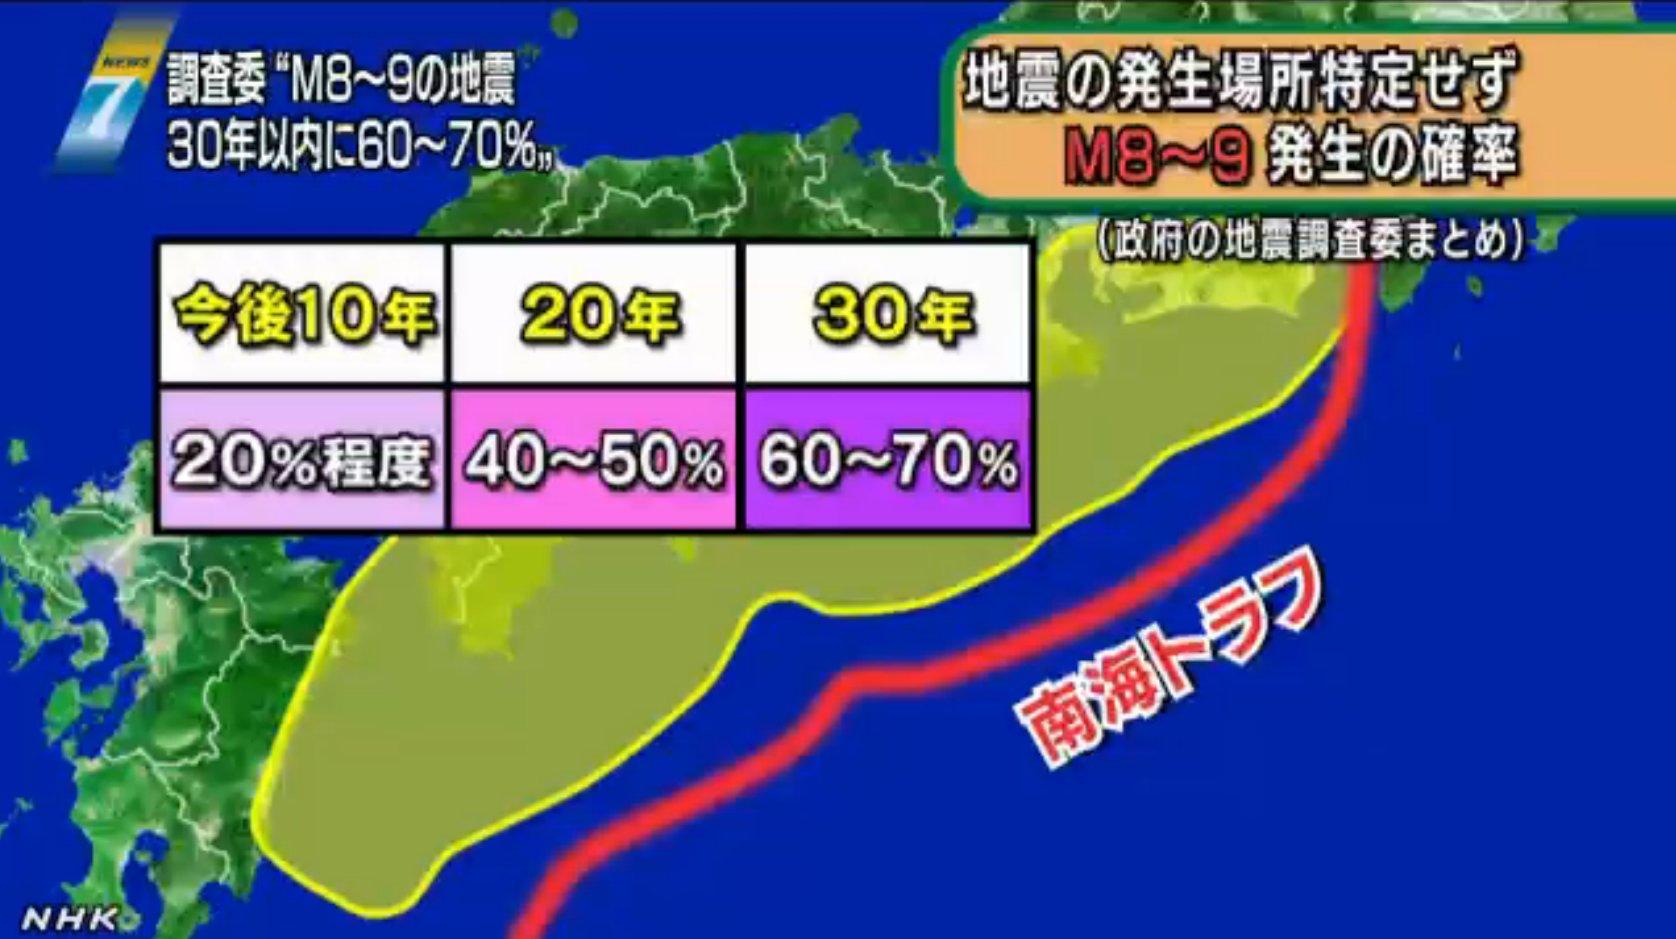 nannkaitorahu kakuritu.jpg?resize=300,169 - 【南海地震予測】他の震災との関連性と発生時期。気になる被害規模は?